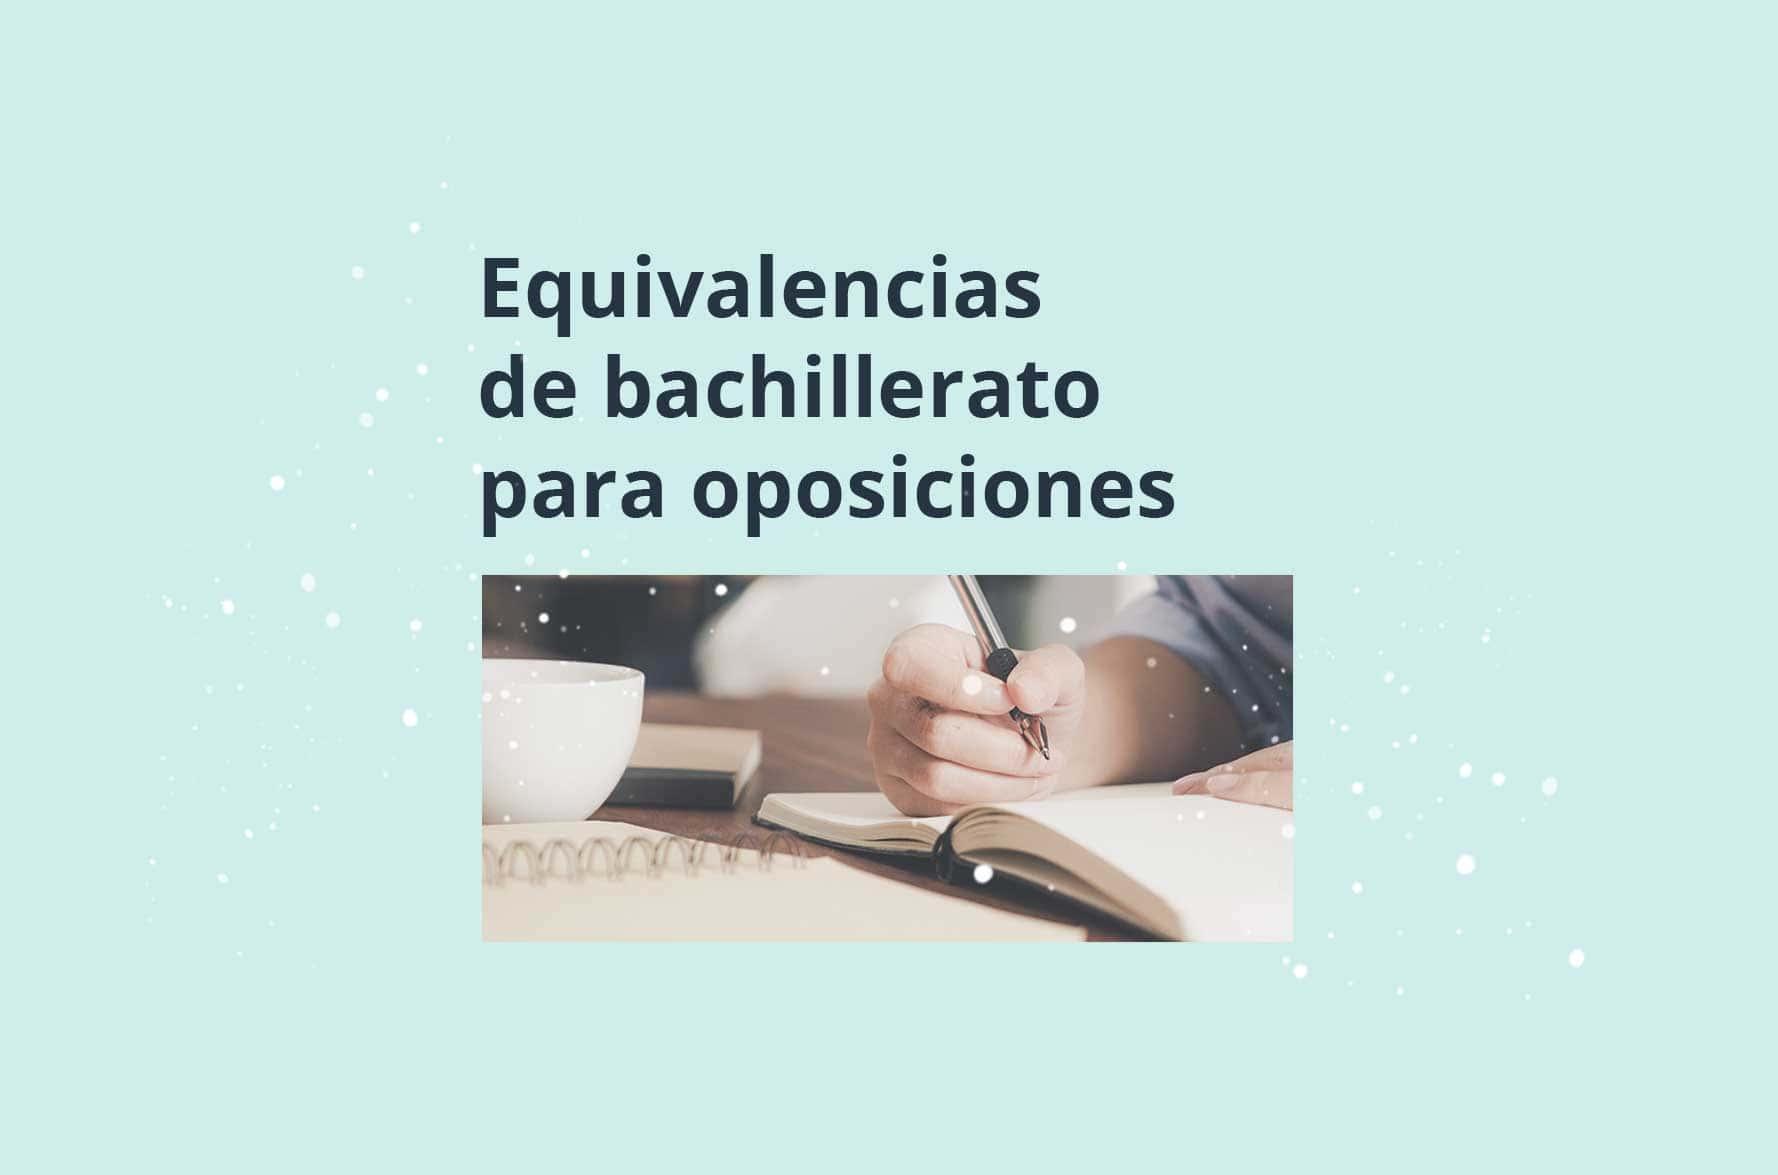 equivalencias-titulo-bachillerato-para-oposiciones